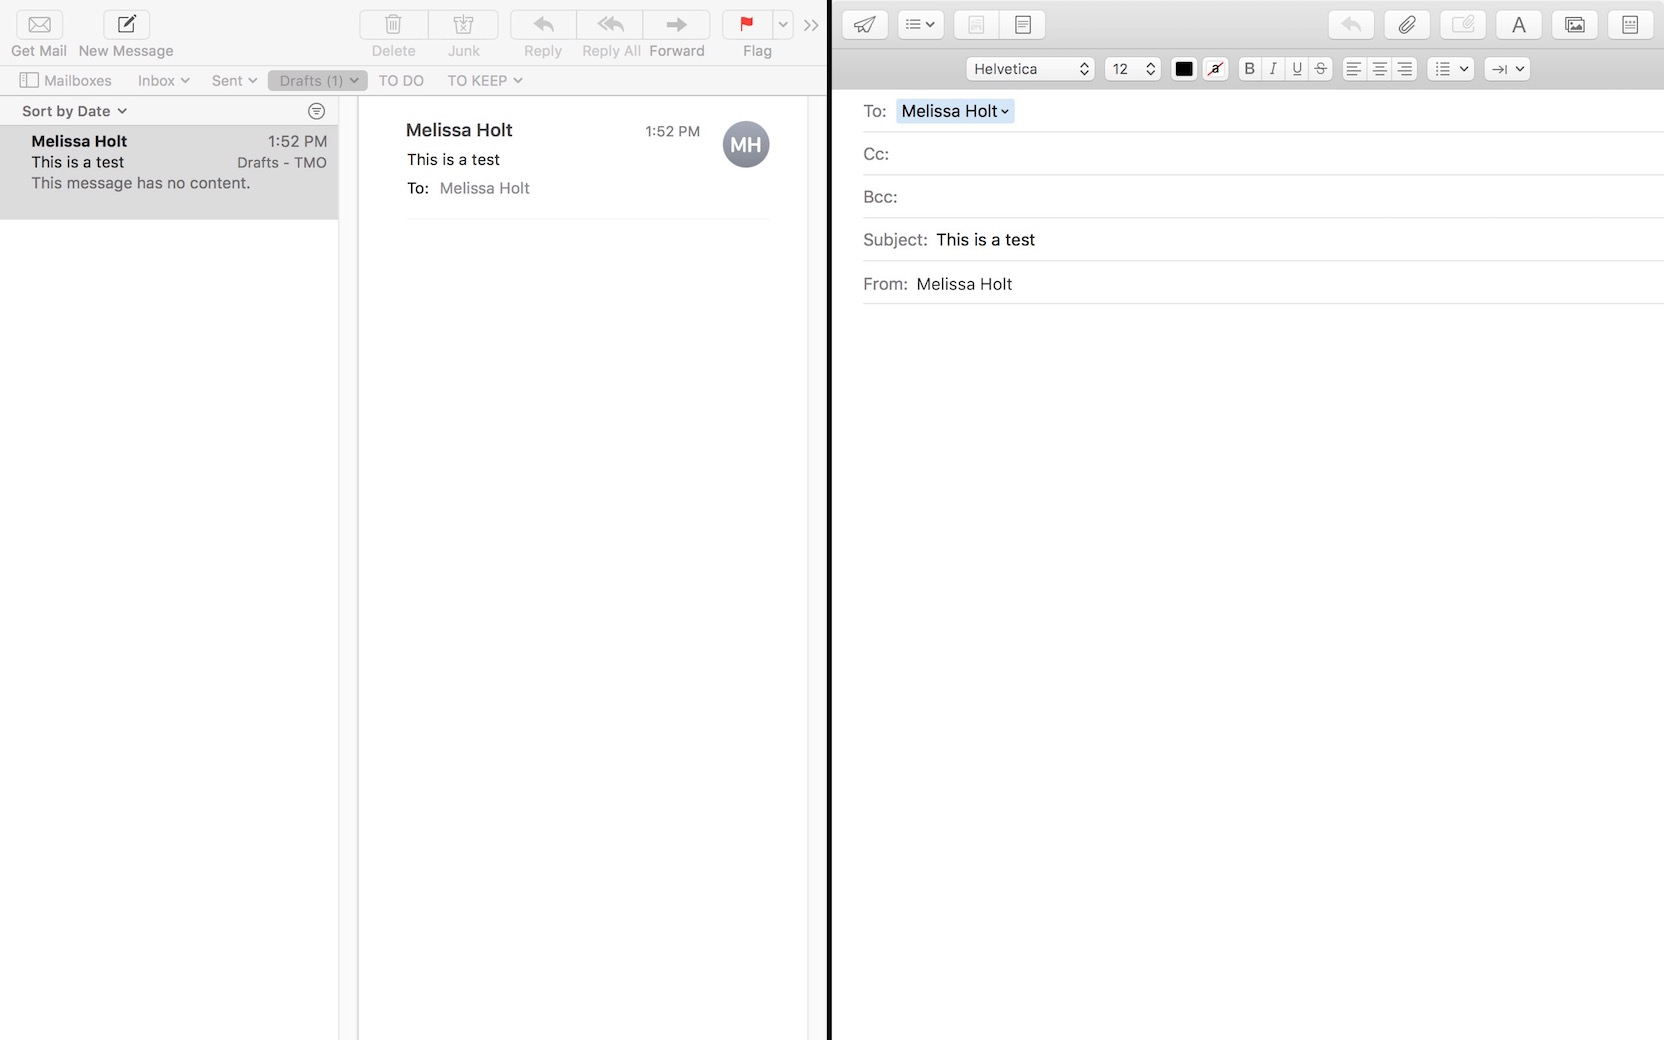 macOS High Sierra Mail in full screen Split Screen View